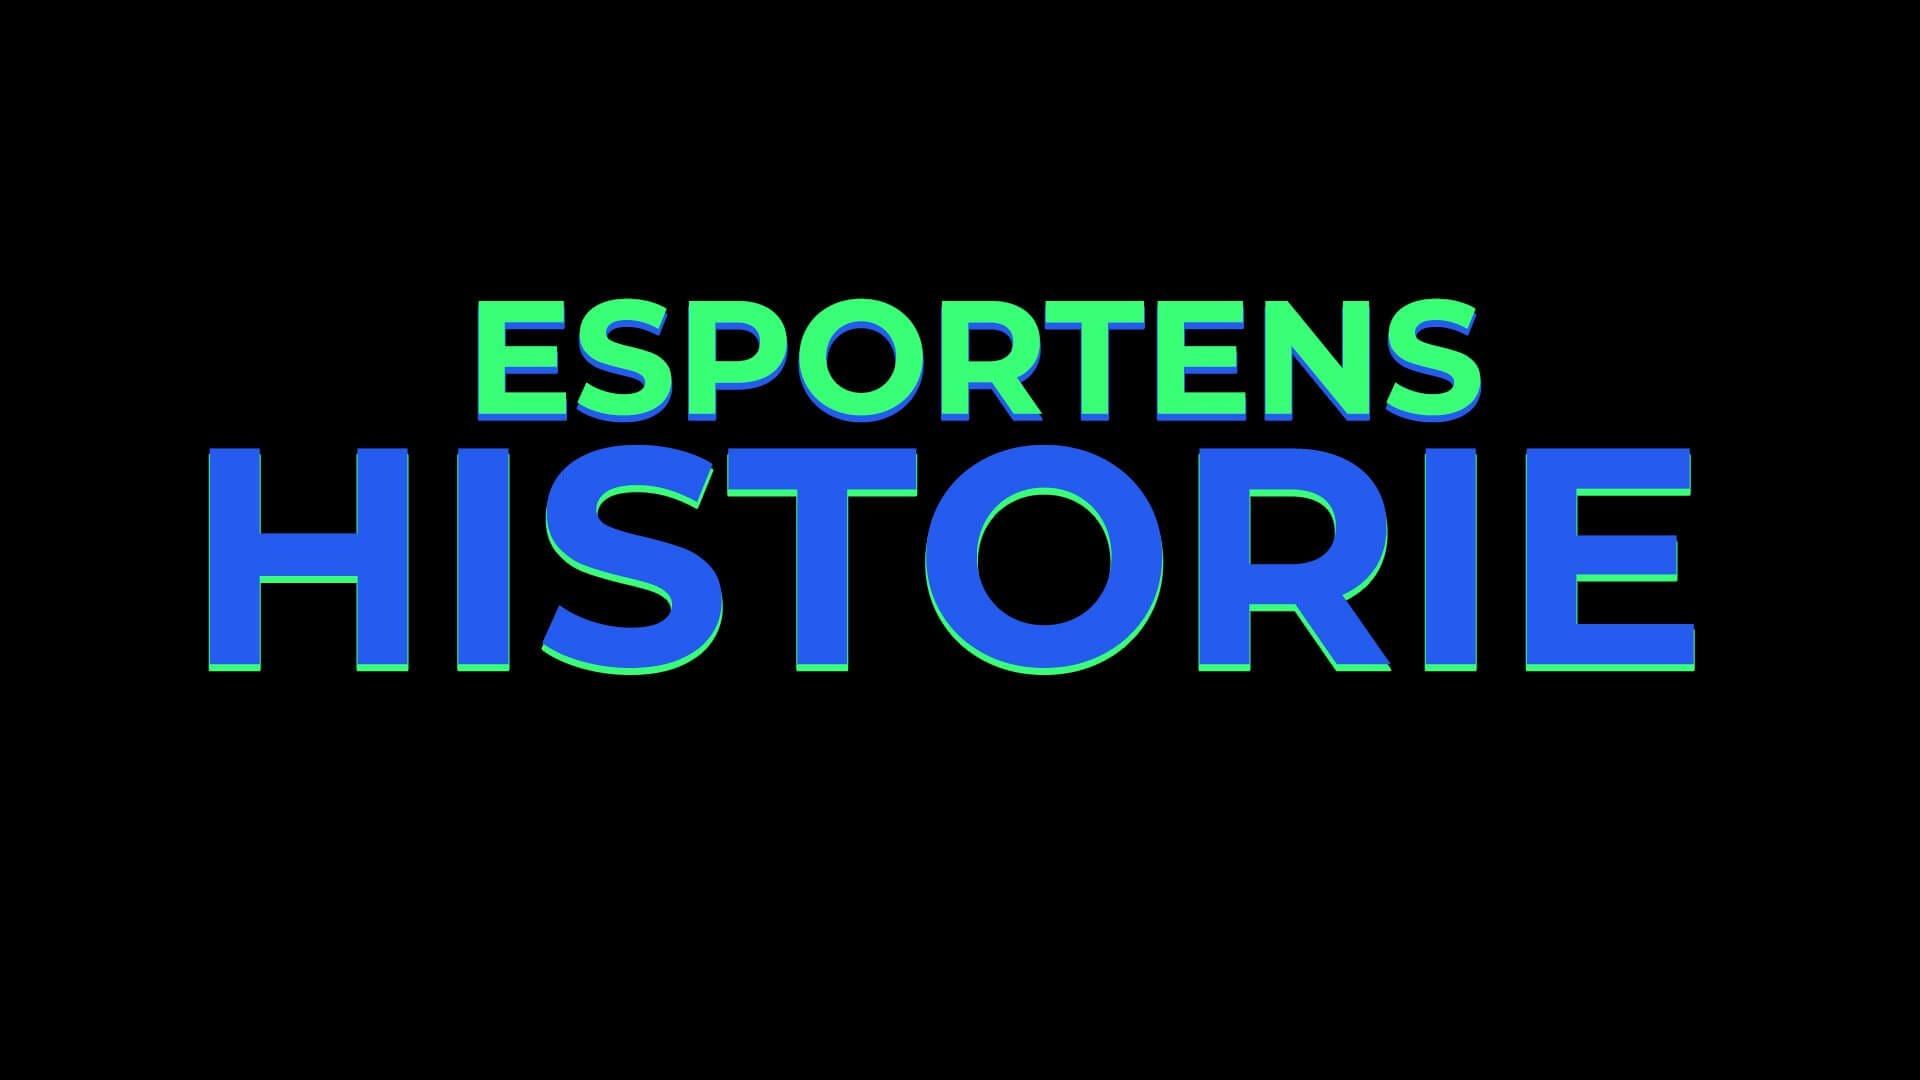 Esportens Historie title